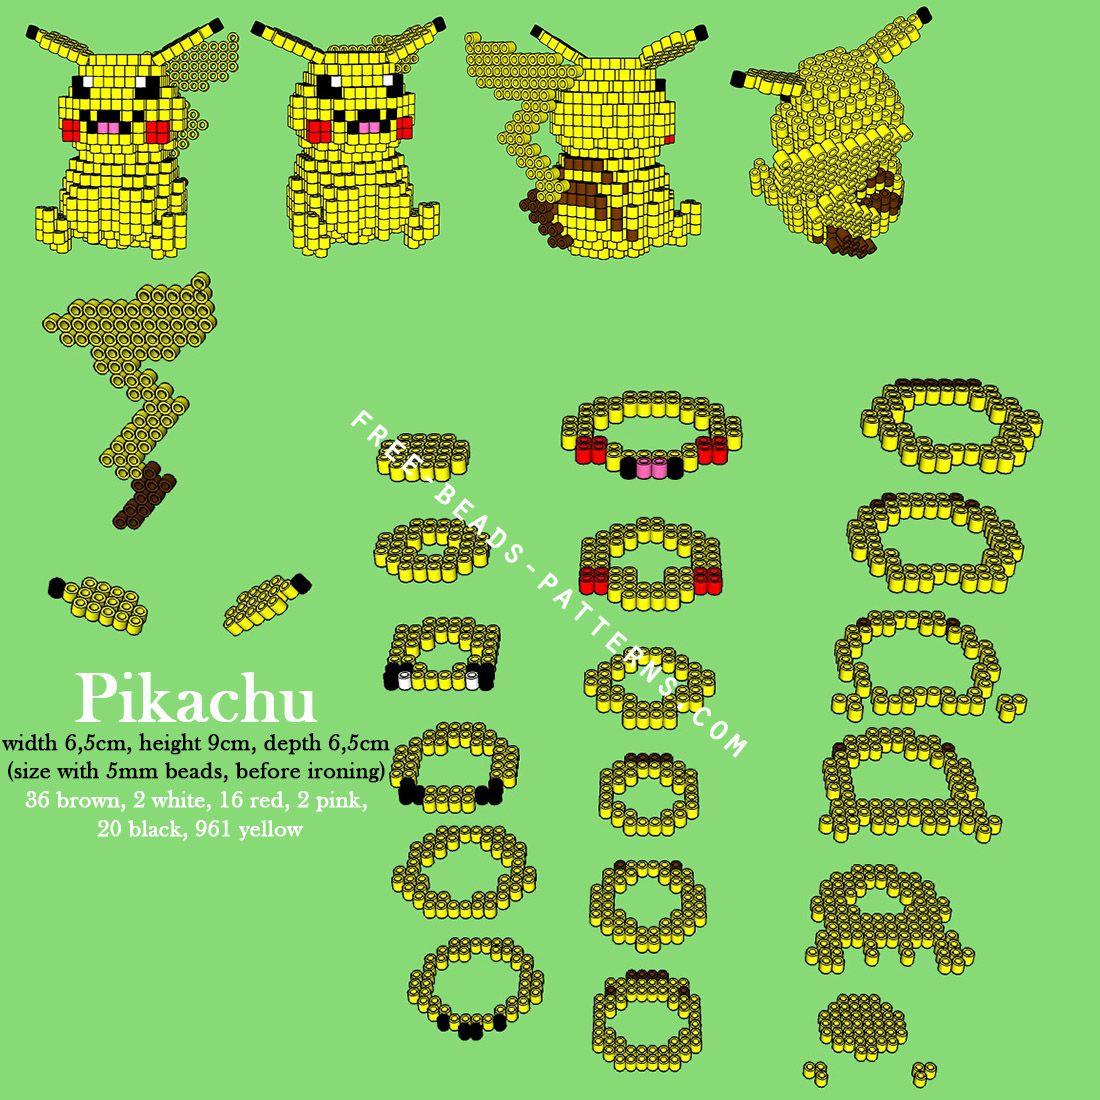 Pikachu Pokemon 3D Perler Beads Hama Pyssla Free